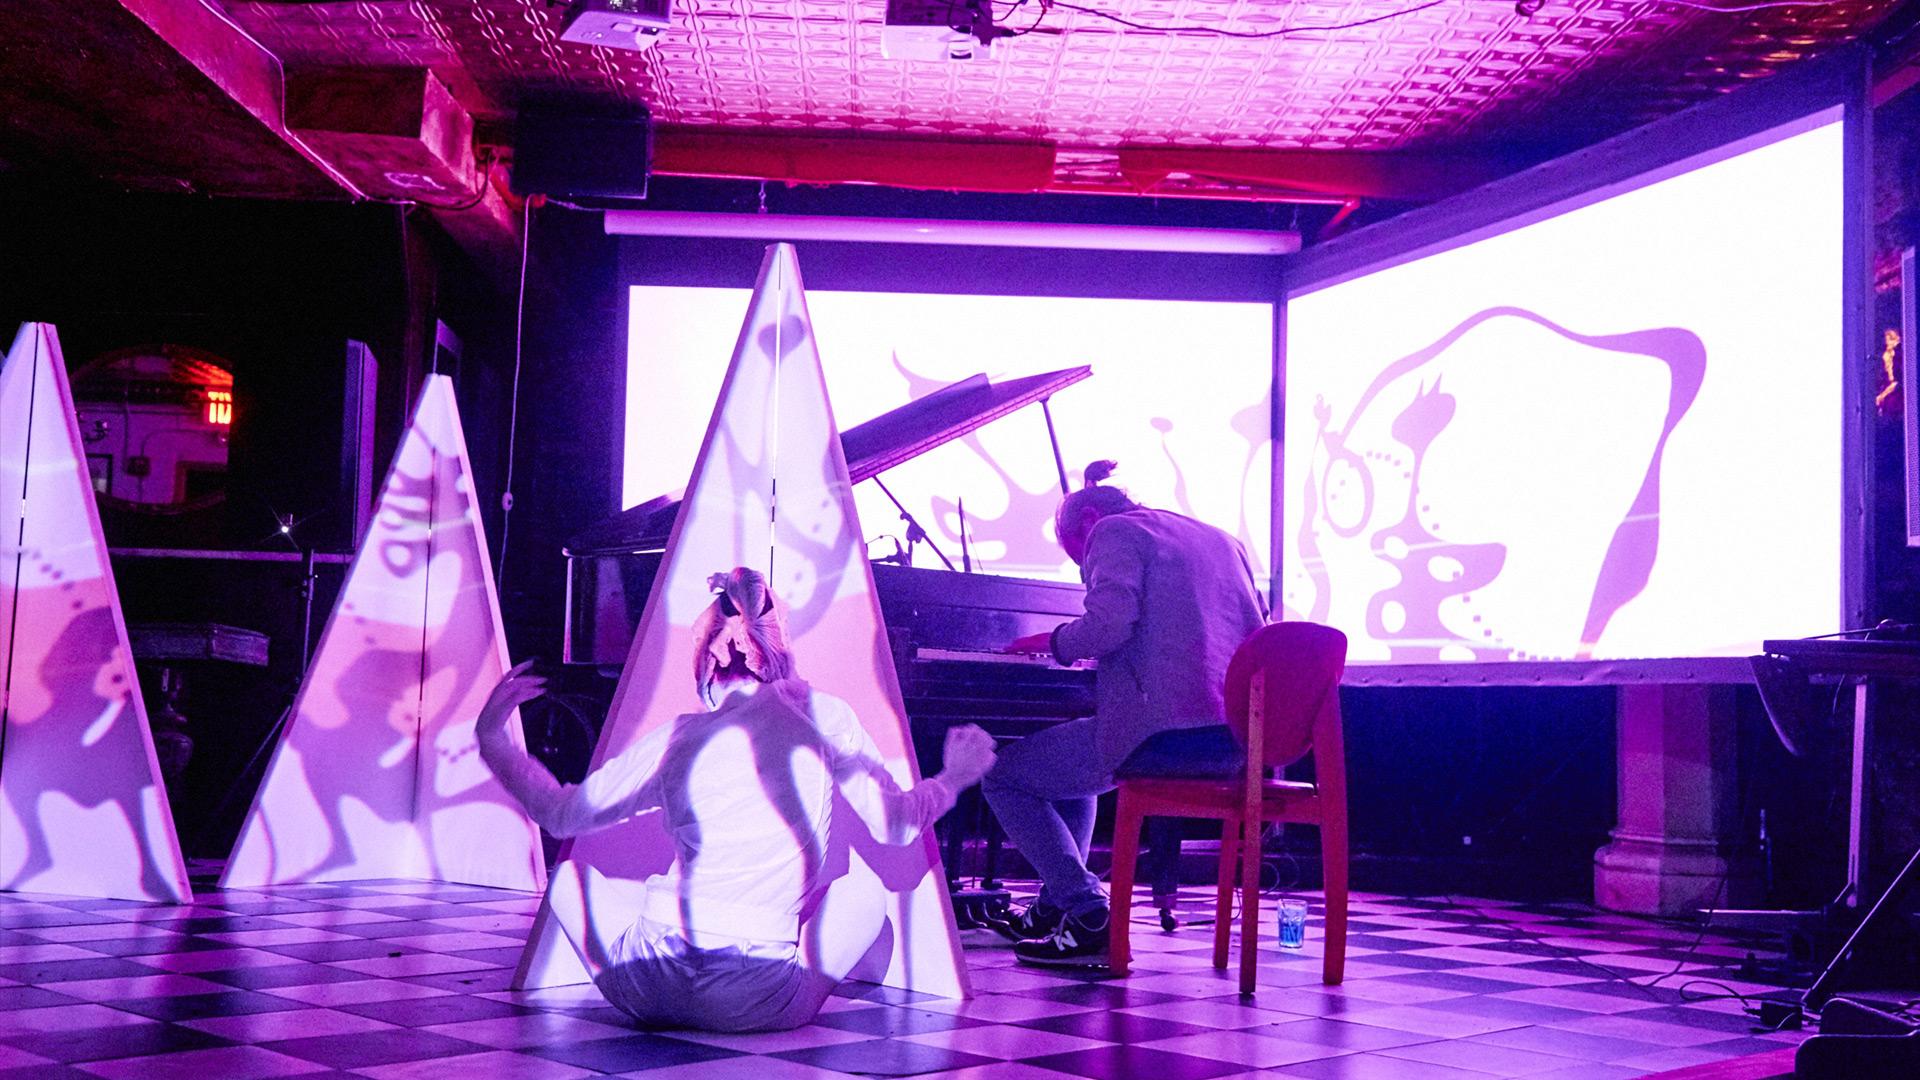 - Piano Warp